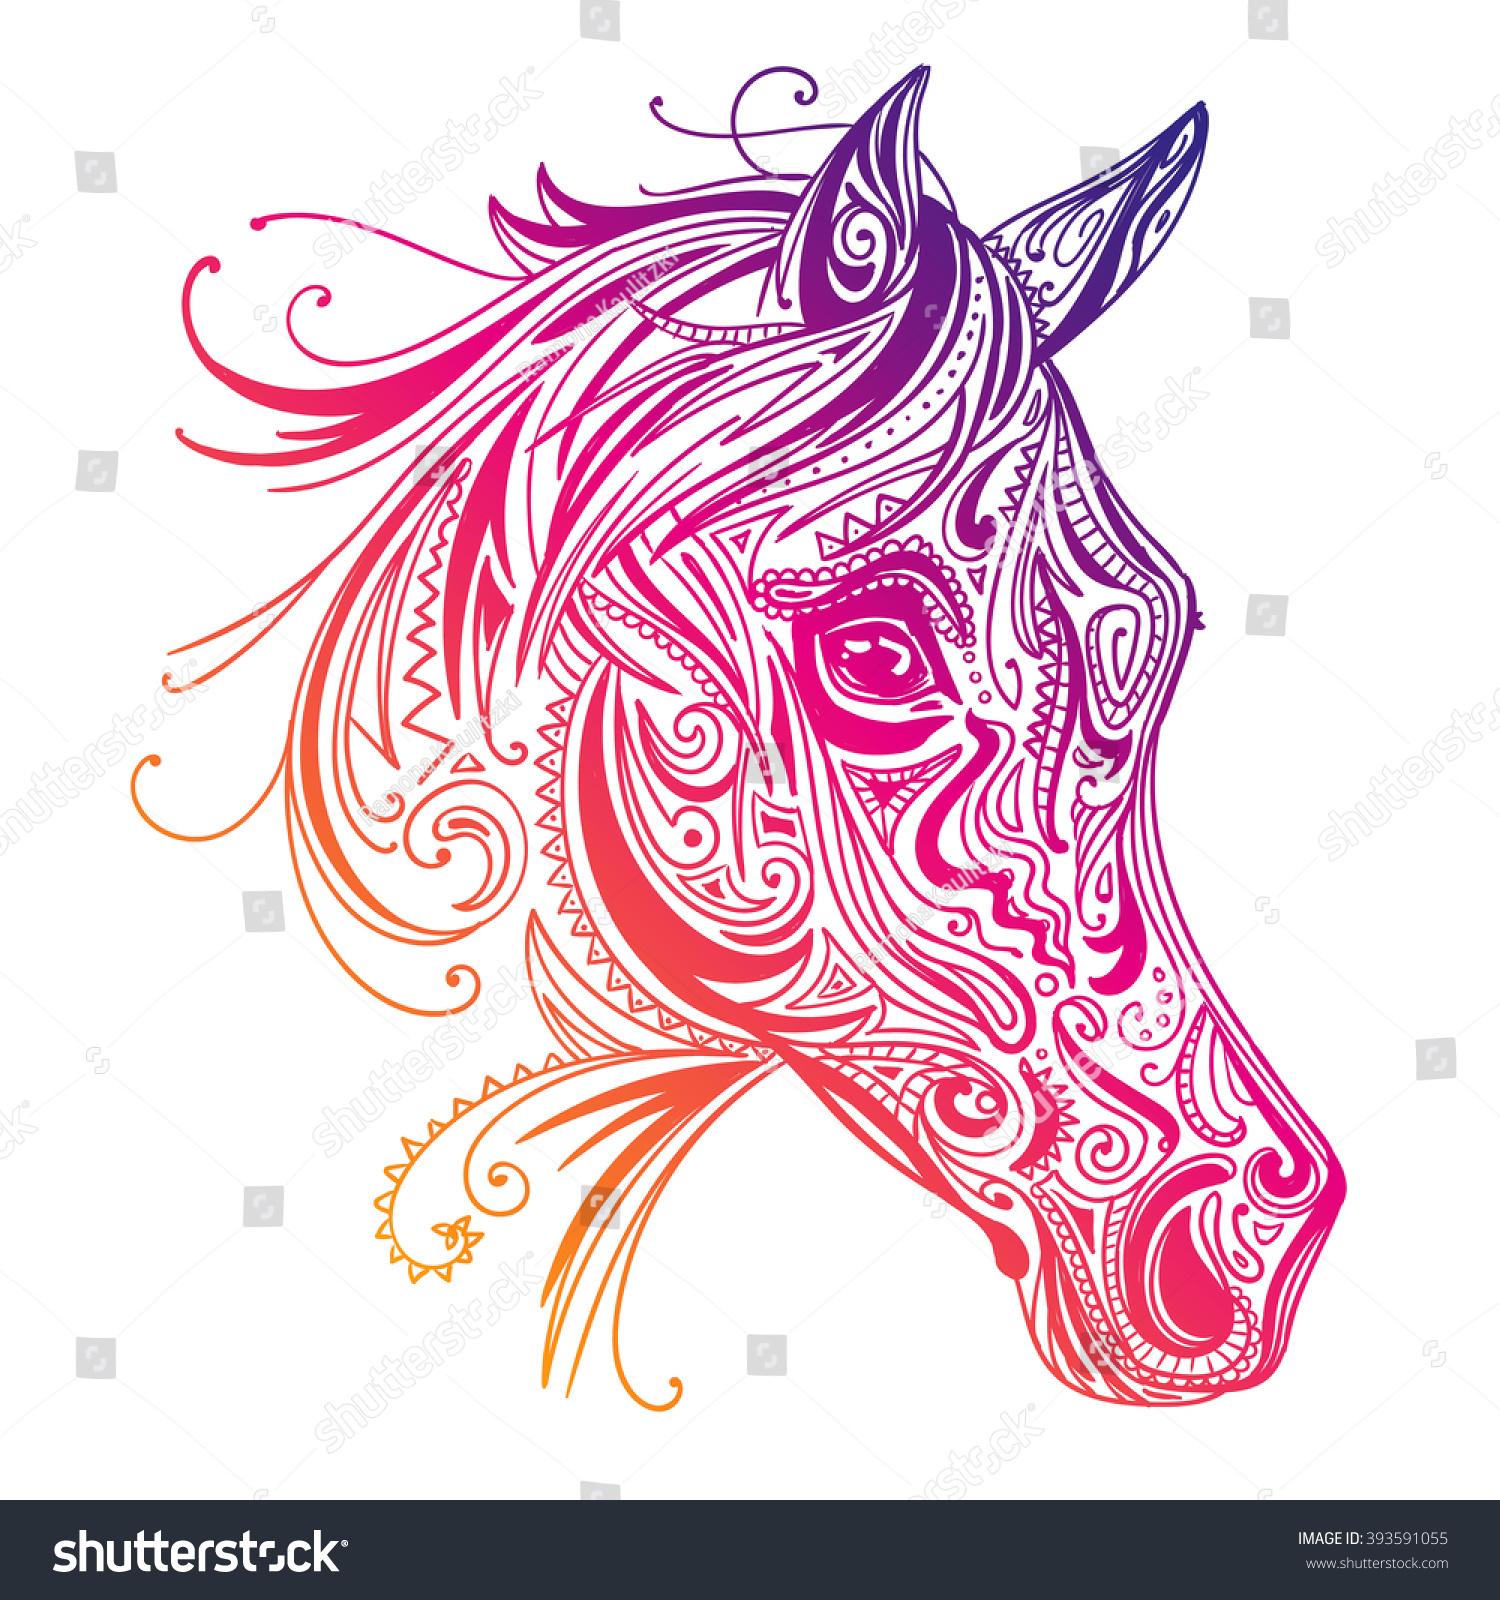 Vector Illustration Abstract Ornamental Horse Stock Vector